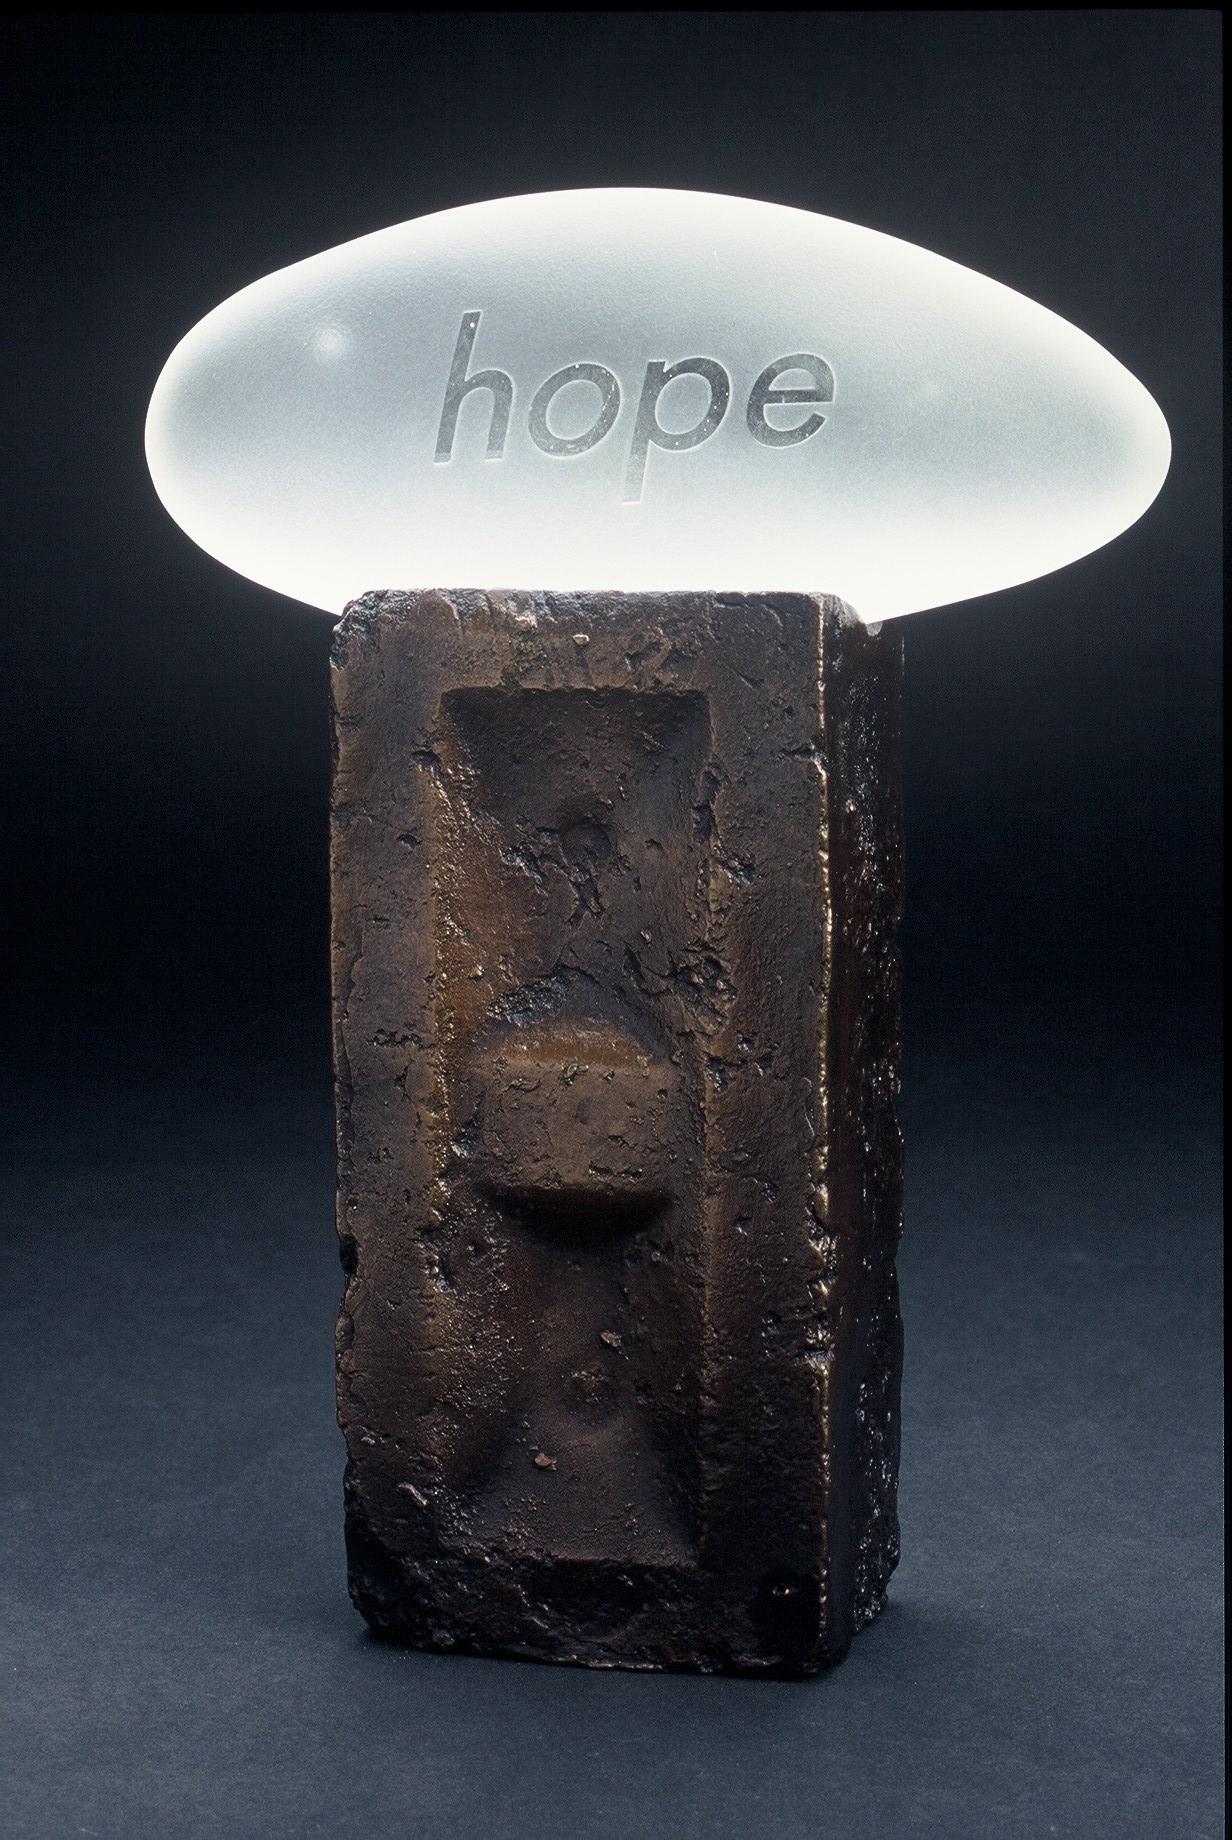 B. Jane Cowie, hope, 2003.JPG